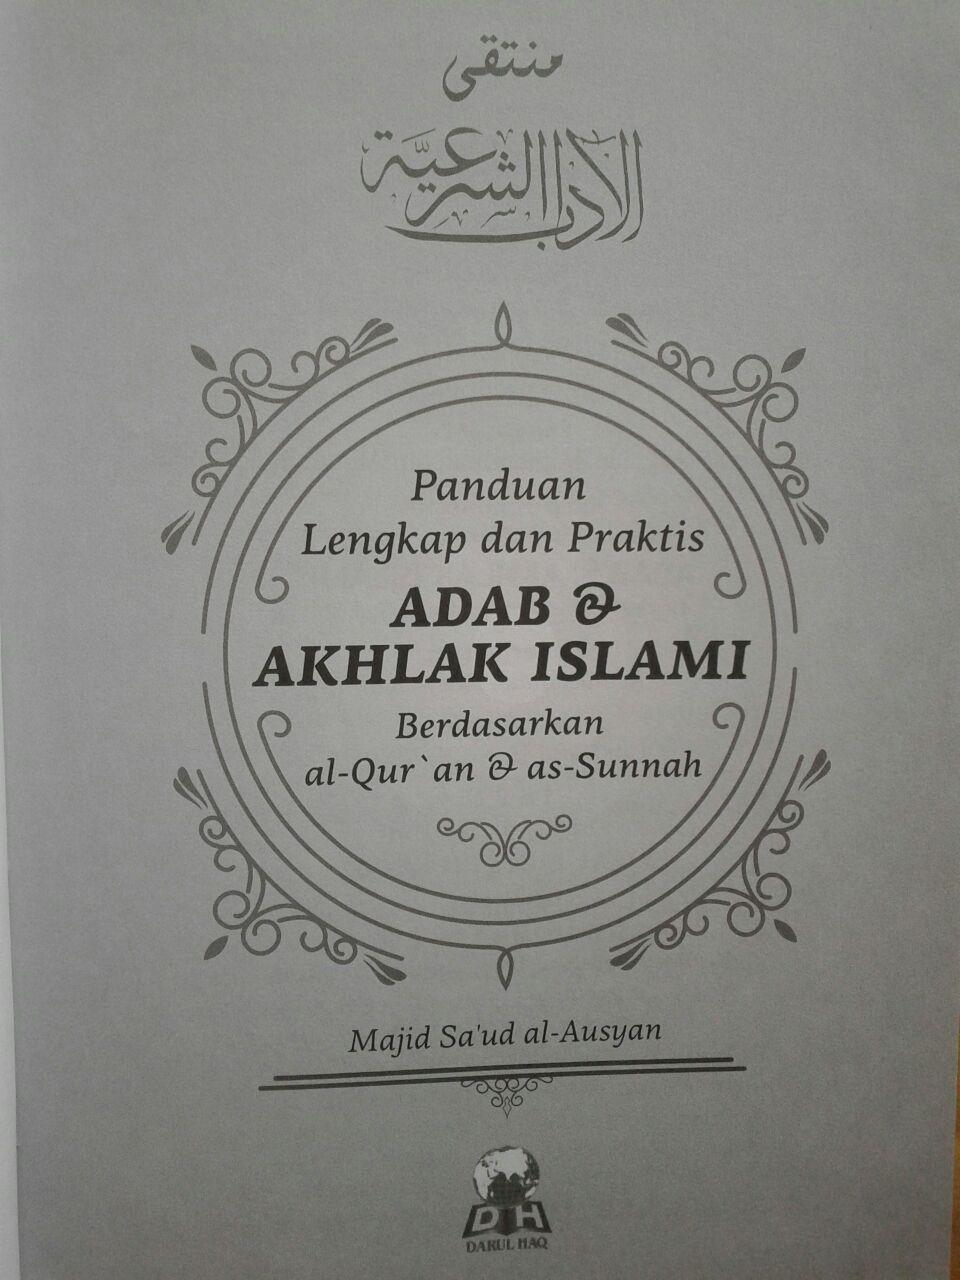 Buku Panduan Lengkap Praktis Adab dan Akhlak Islami isi 5